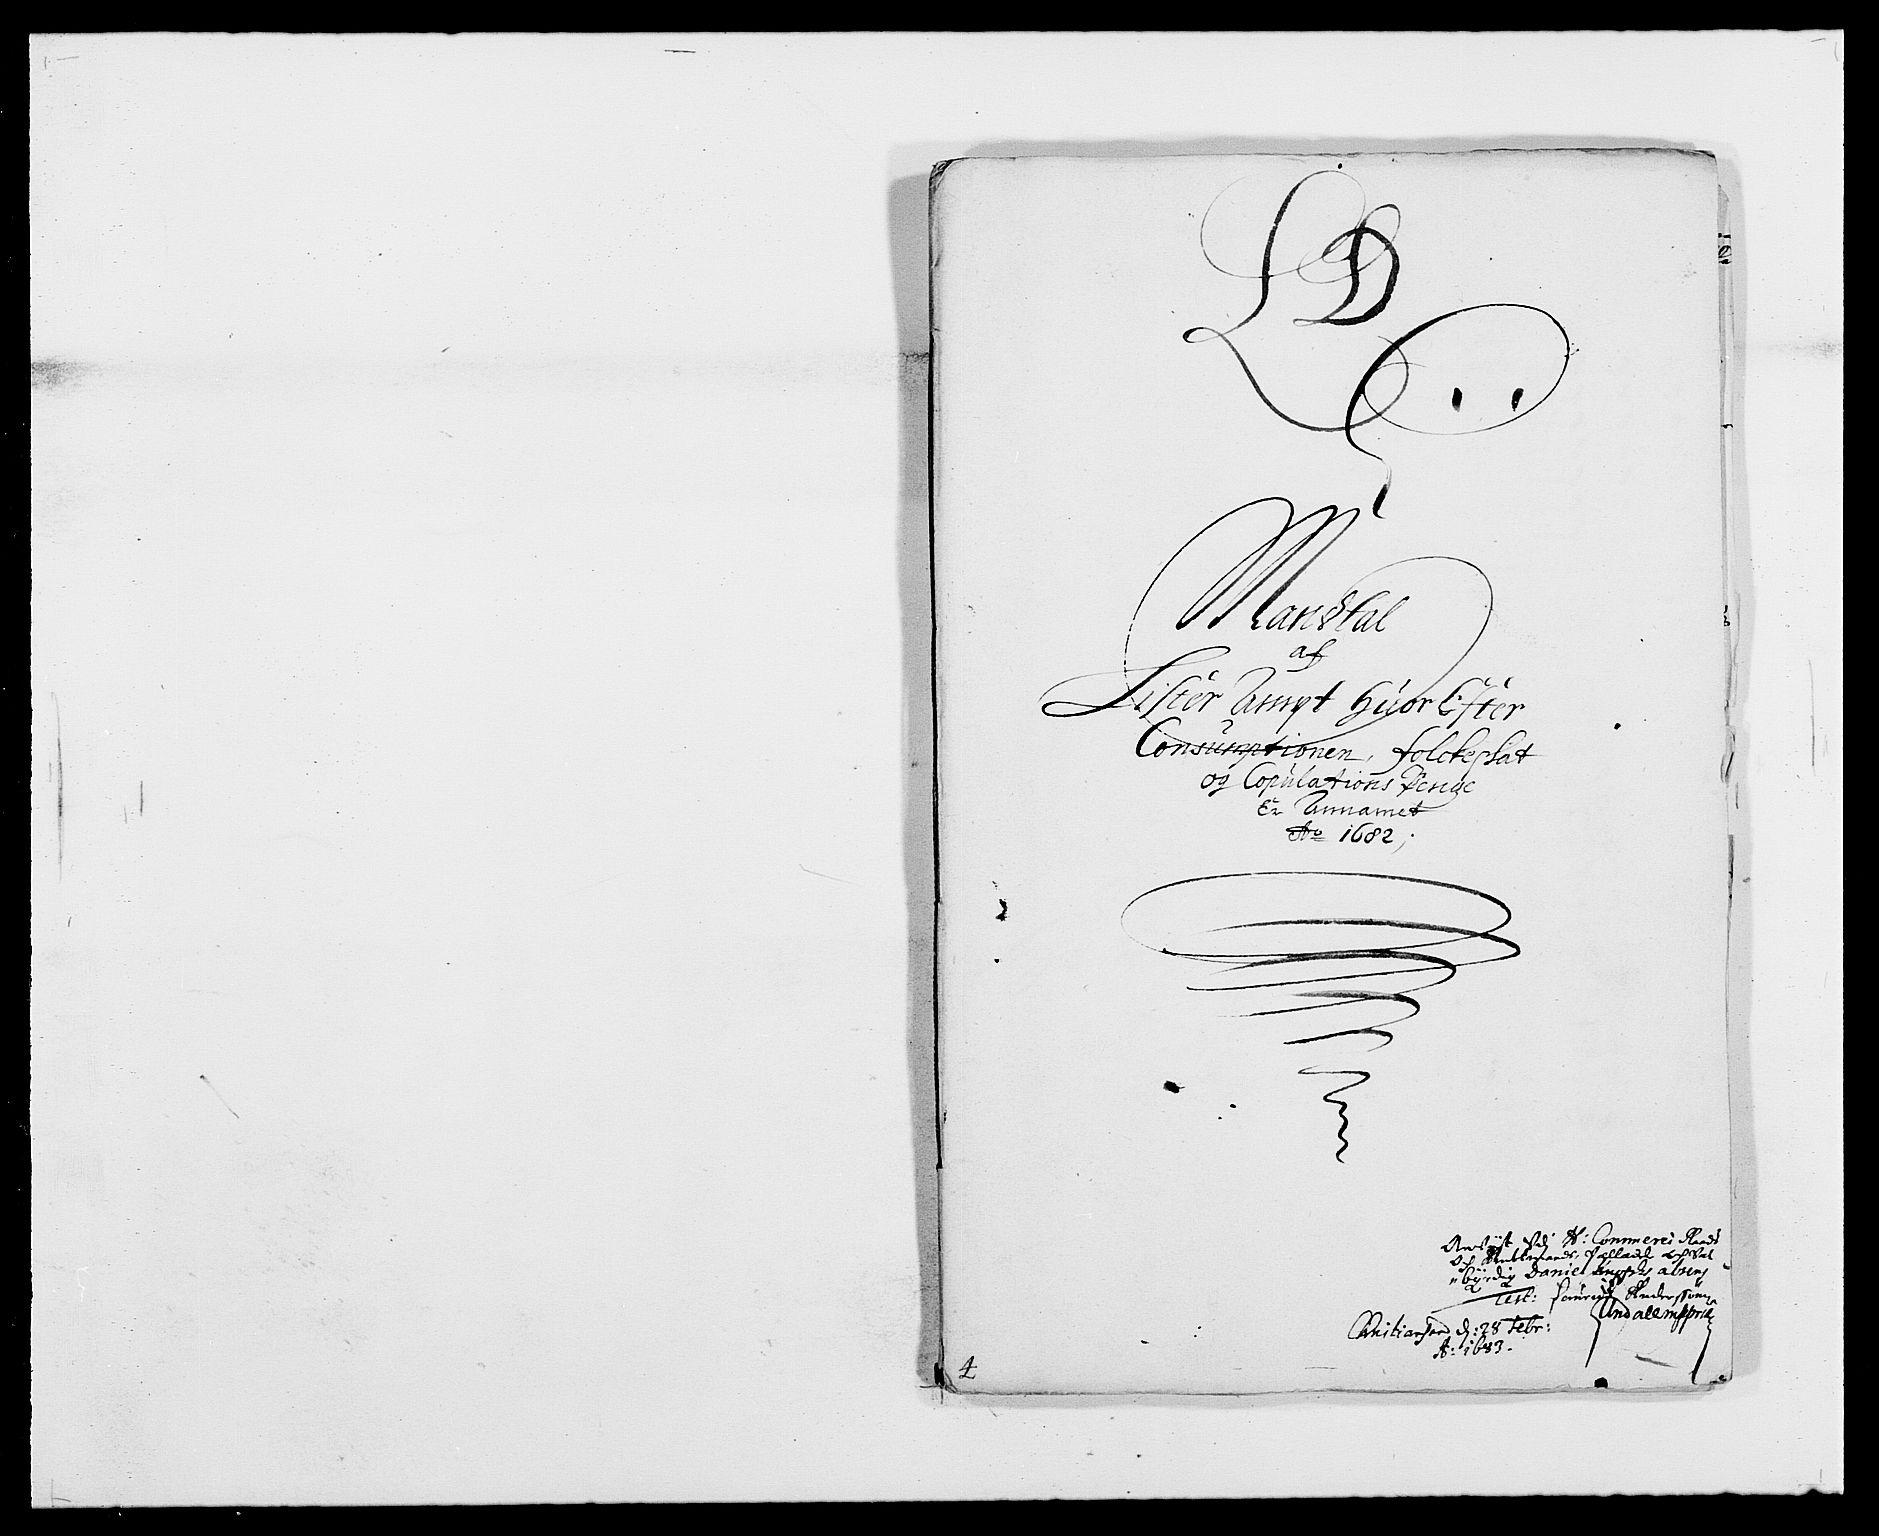 RA, Rentekammeret inntil 1814, Reviderte regnskaper, Fogderegnskap, R41/L2531: Fogderegnskap Lista, 1680-1682, s. 207